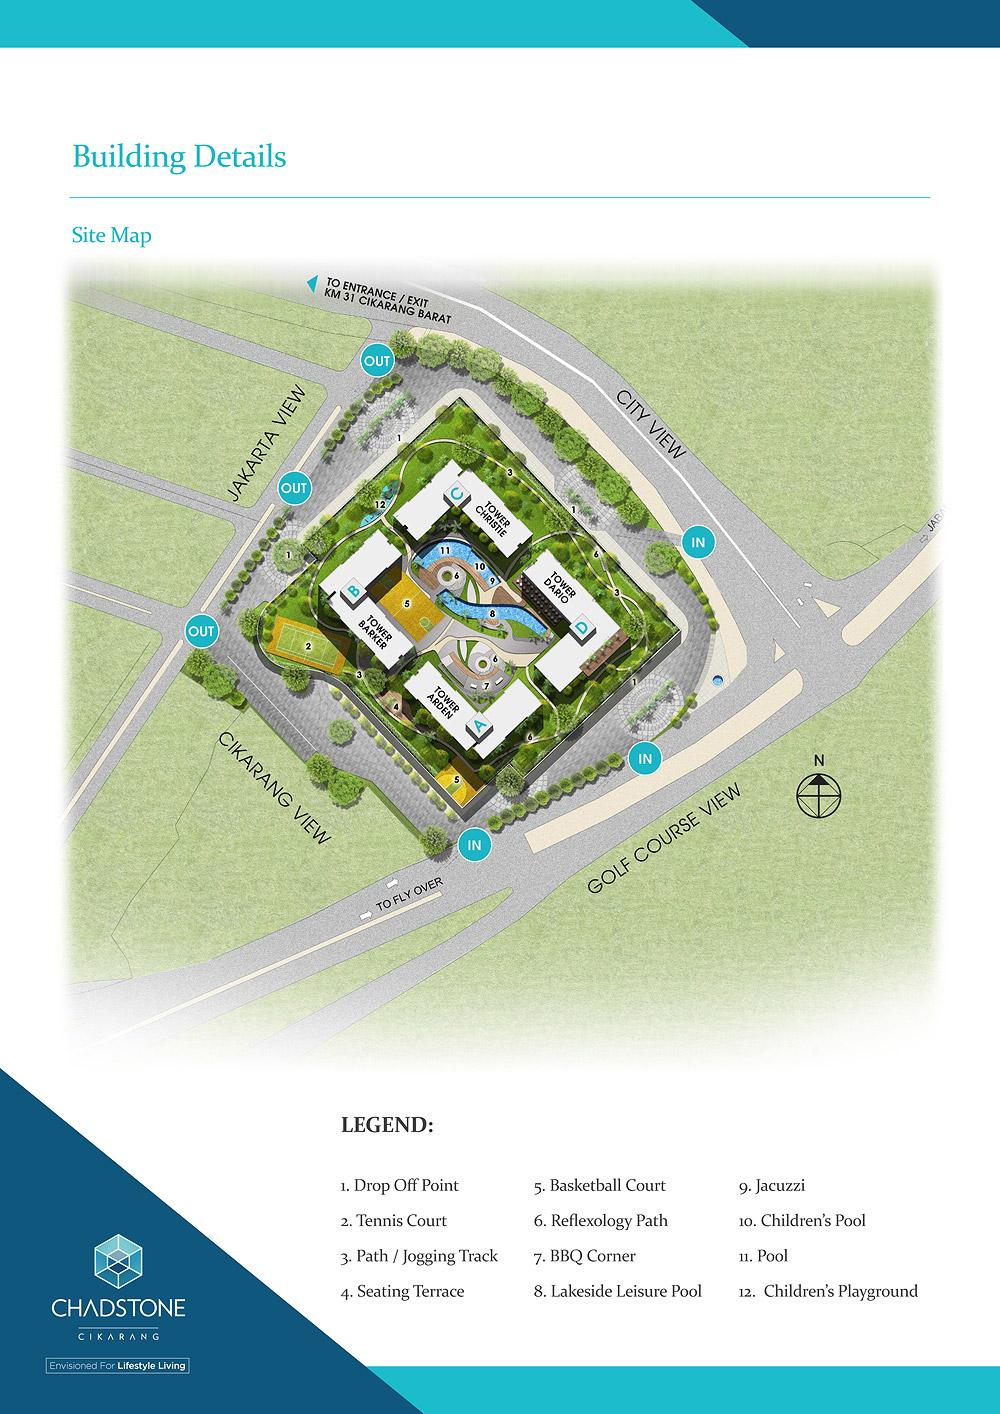 Building Details: Key Plans, Site Map, Floor Layouts Chadstone Cikarang